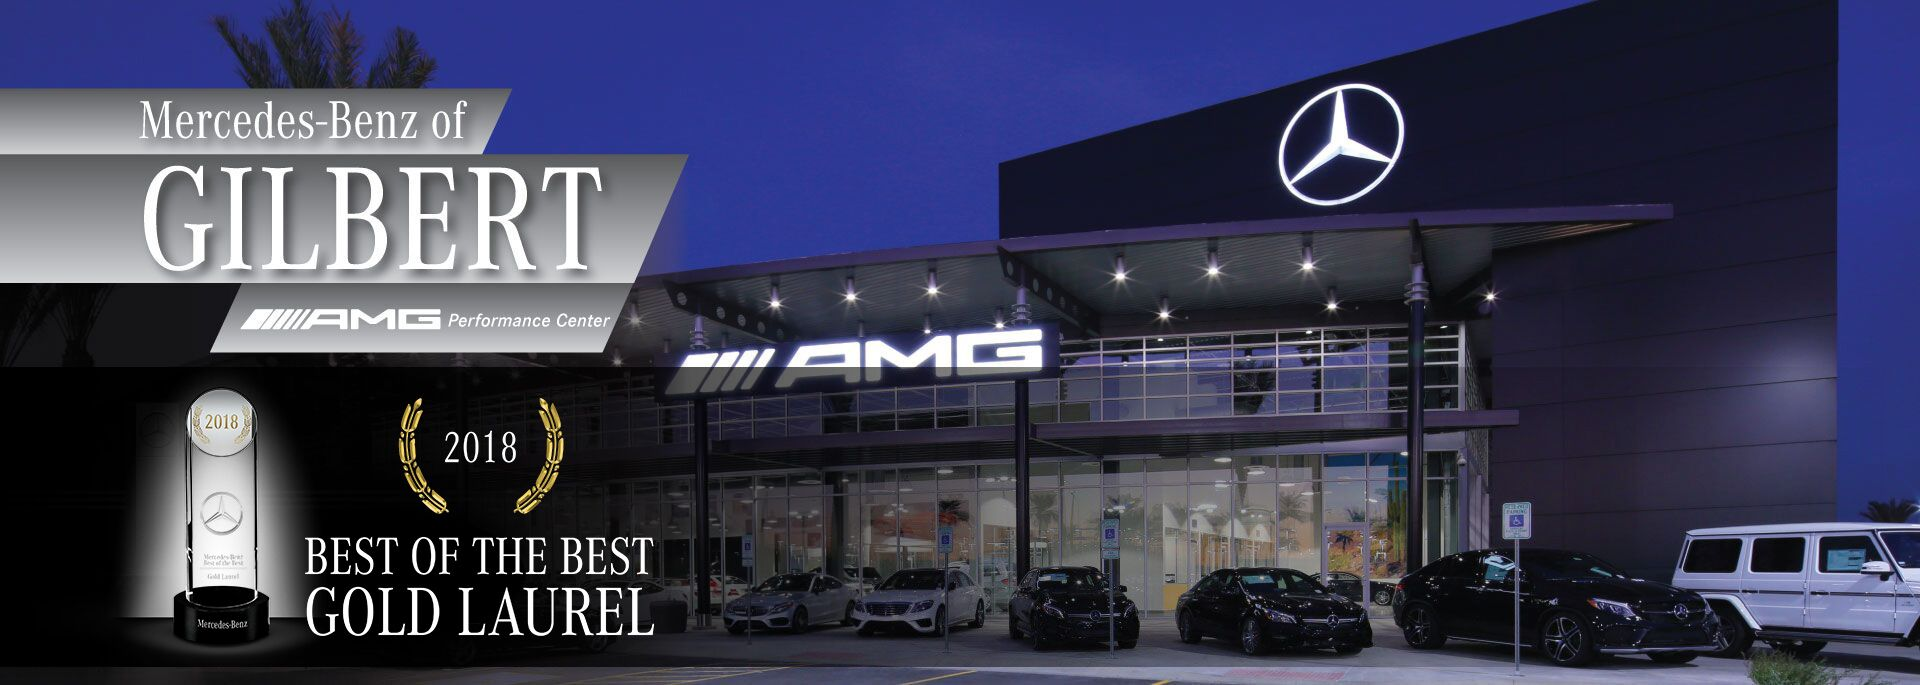 Mercedes Benz Dealers >> Mercedes Benz Dealership Gilbert Az Used Cars Mercedes Benz Of Gilbert